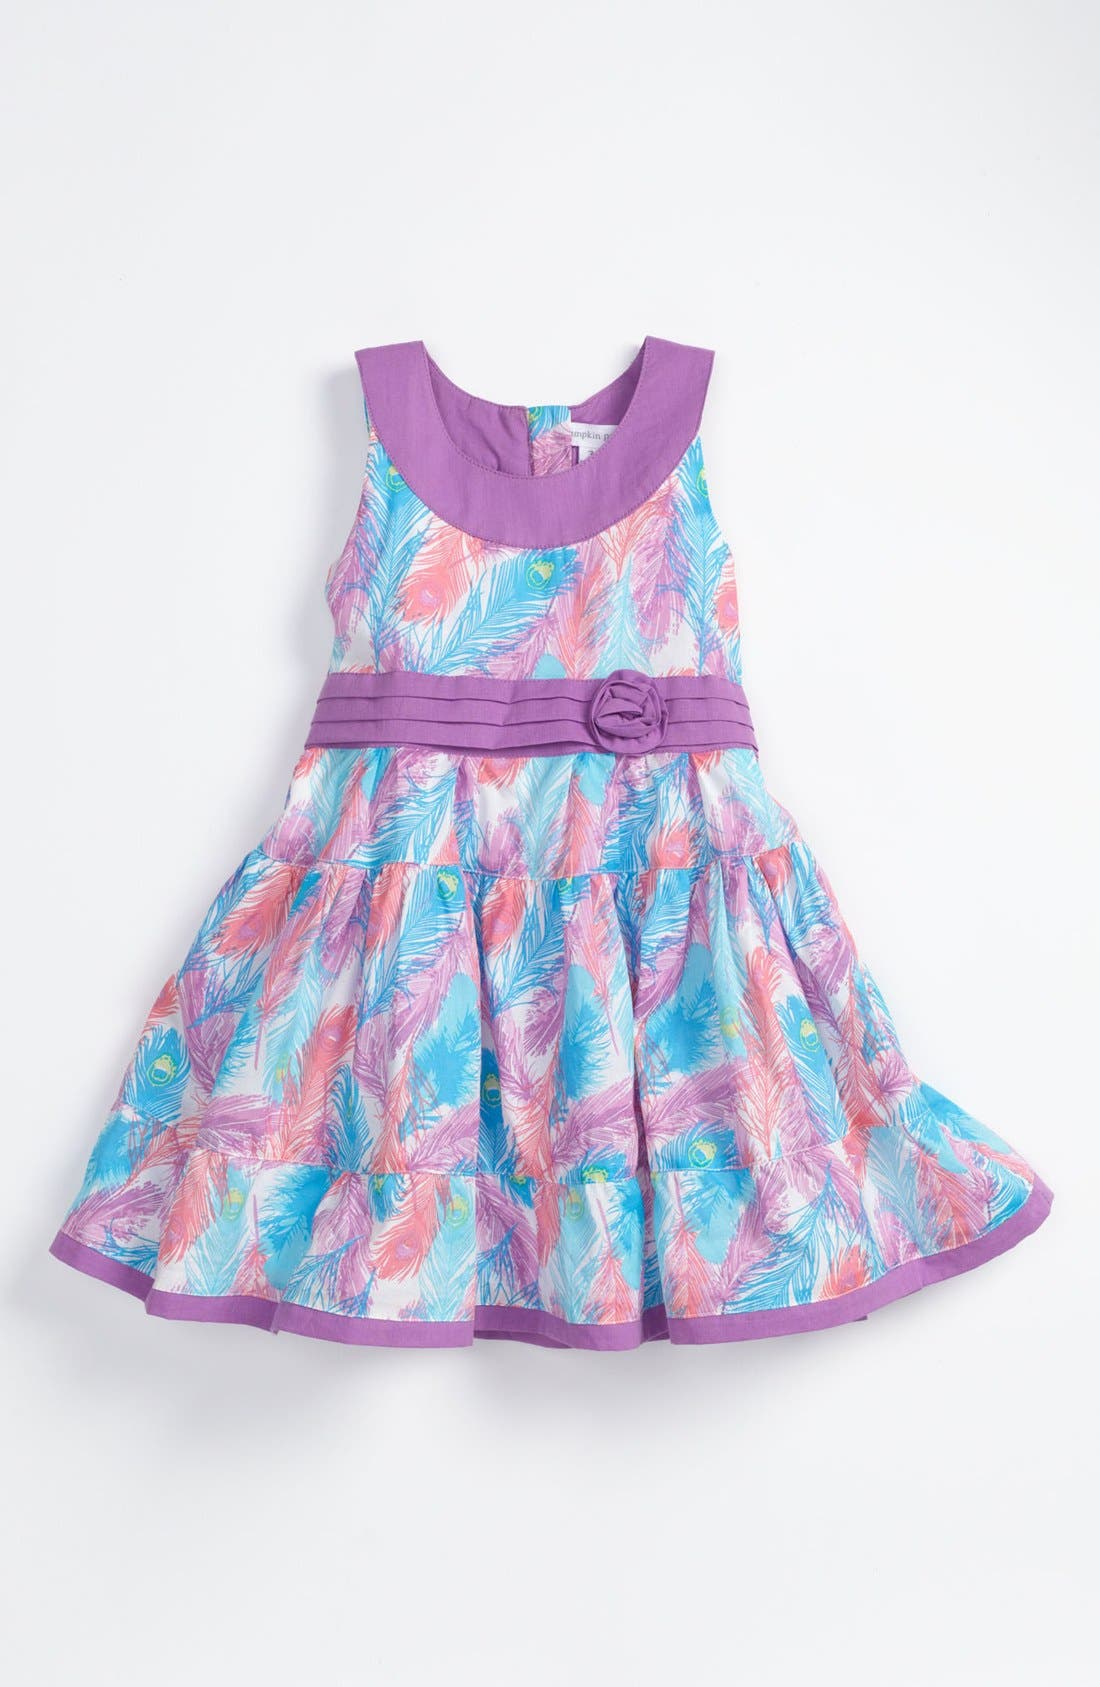 Main Image - Pumpkin Patch Feather Print Dress (Toddler)